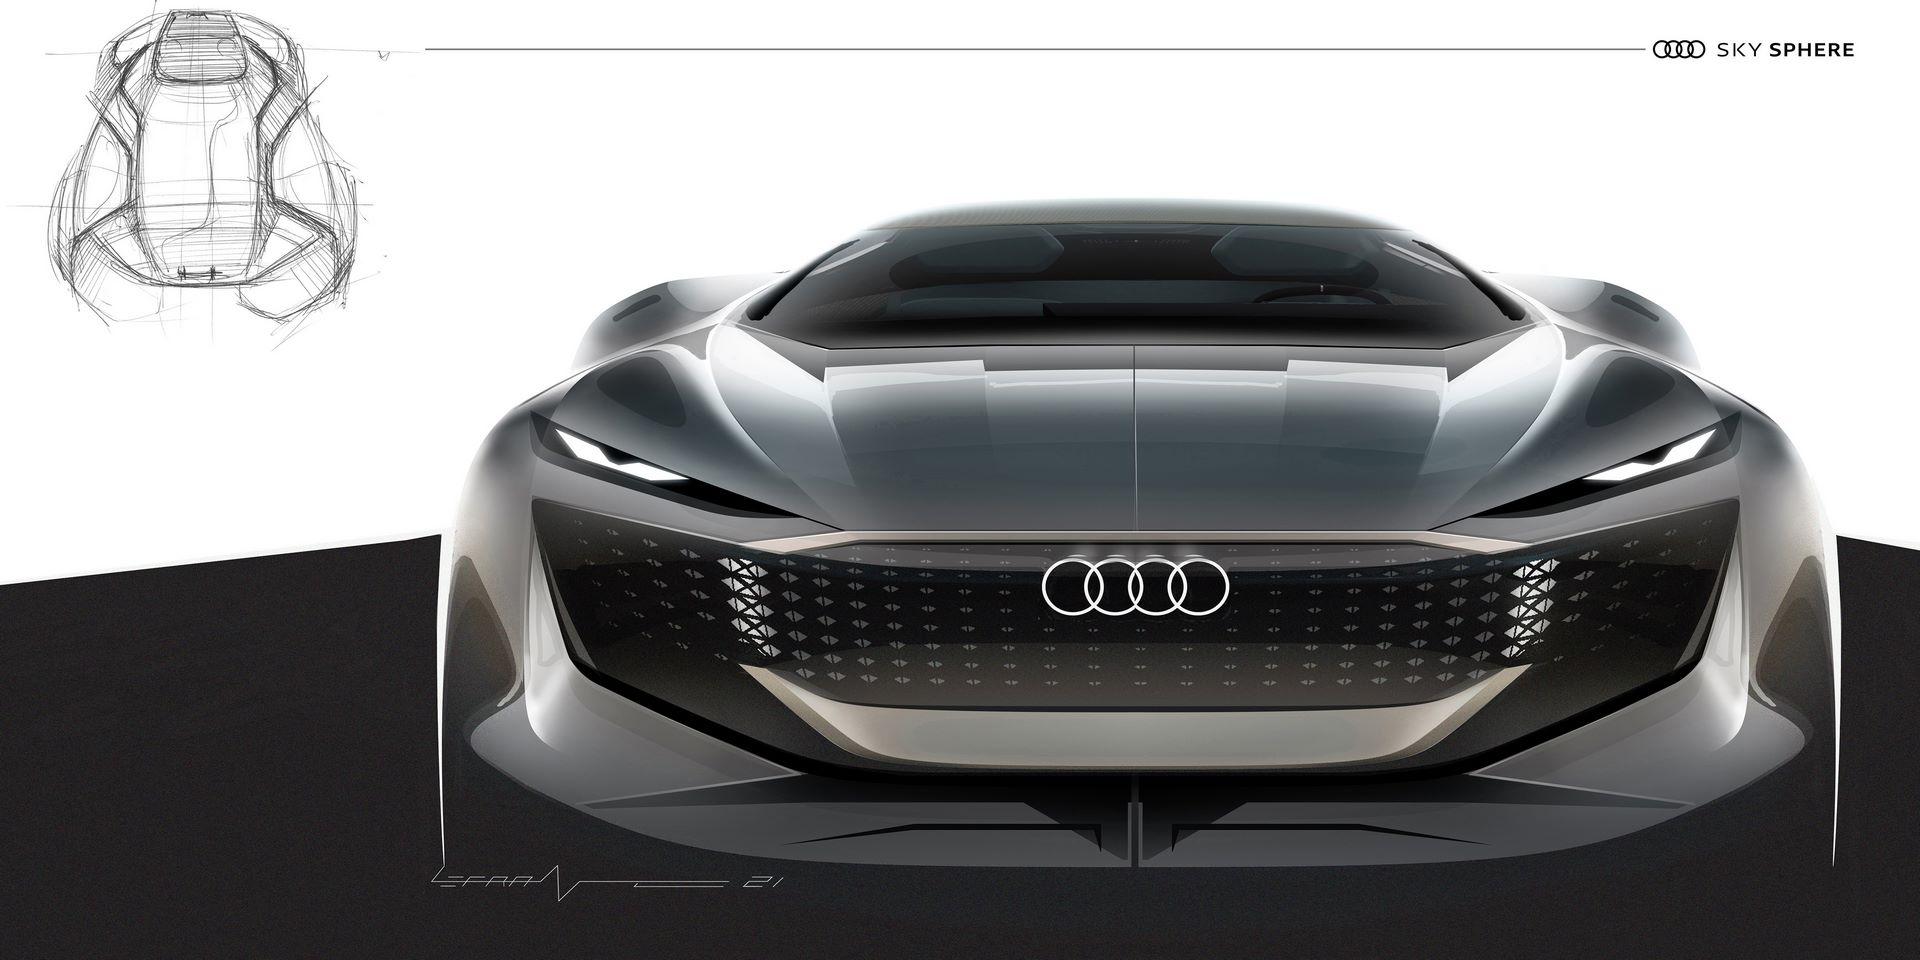 Audi-Skysphere-Concept-38